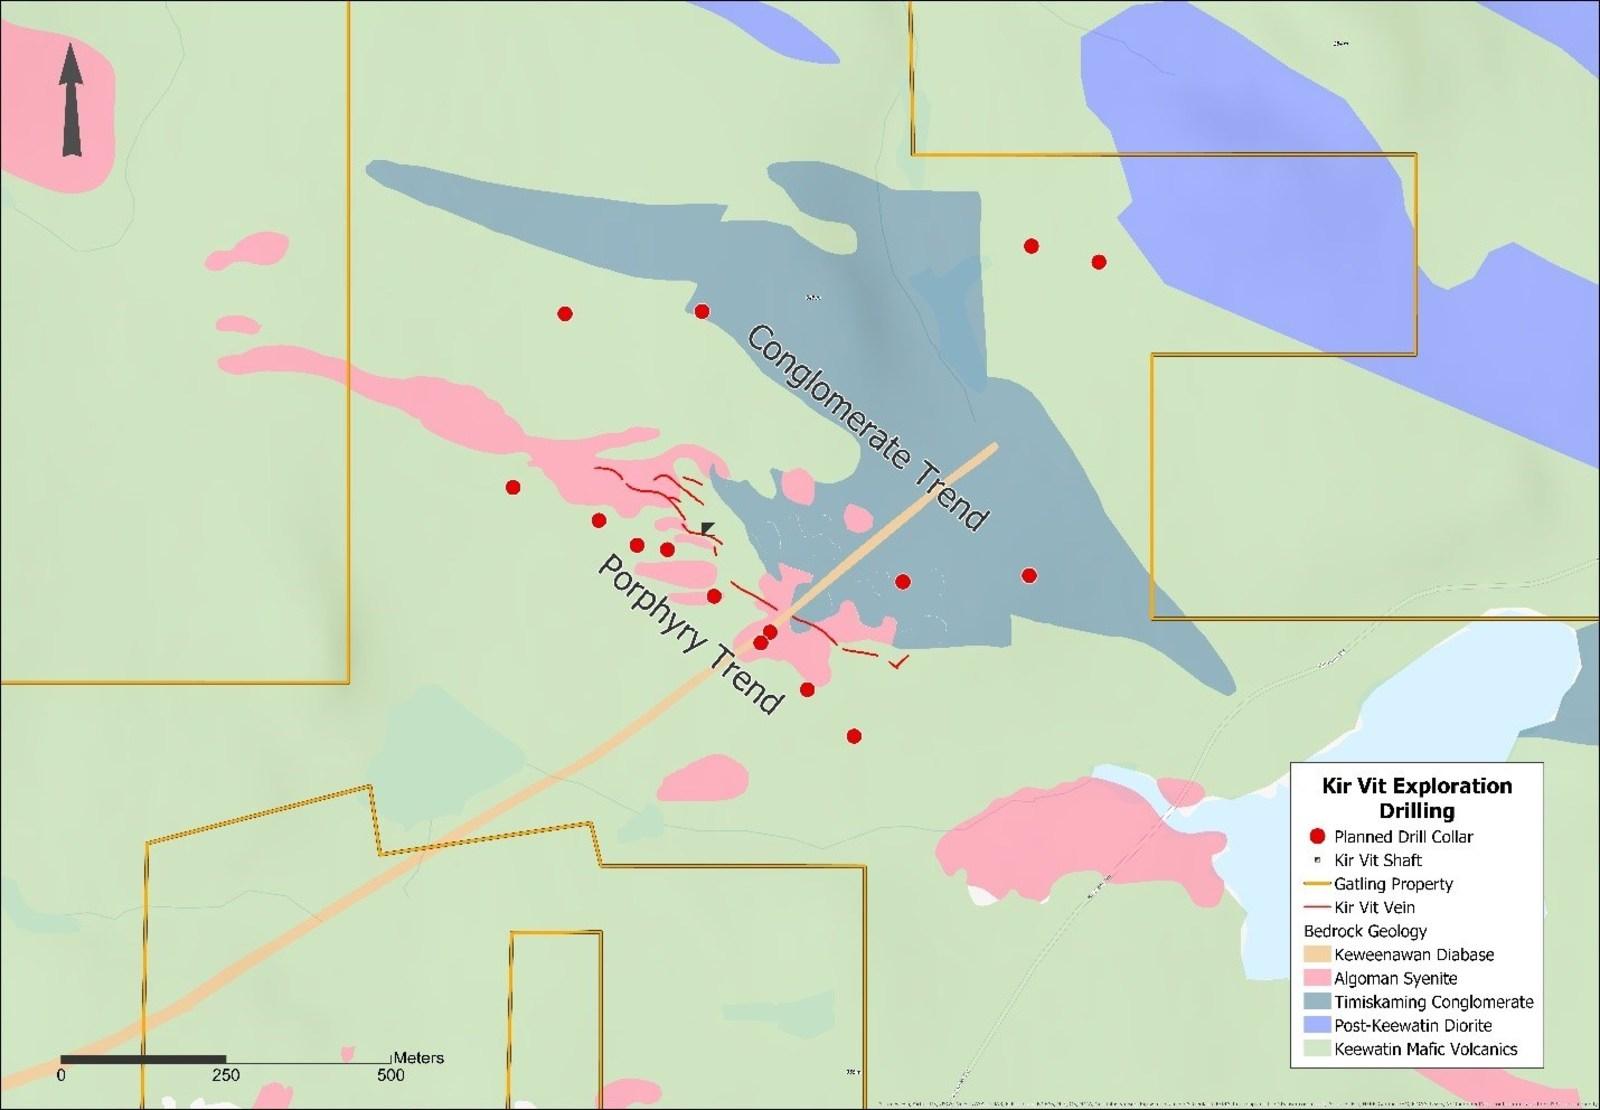 Figure 4. Kir Vit property surface drilling status map showing local geology.